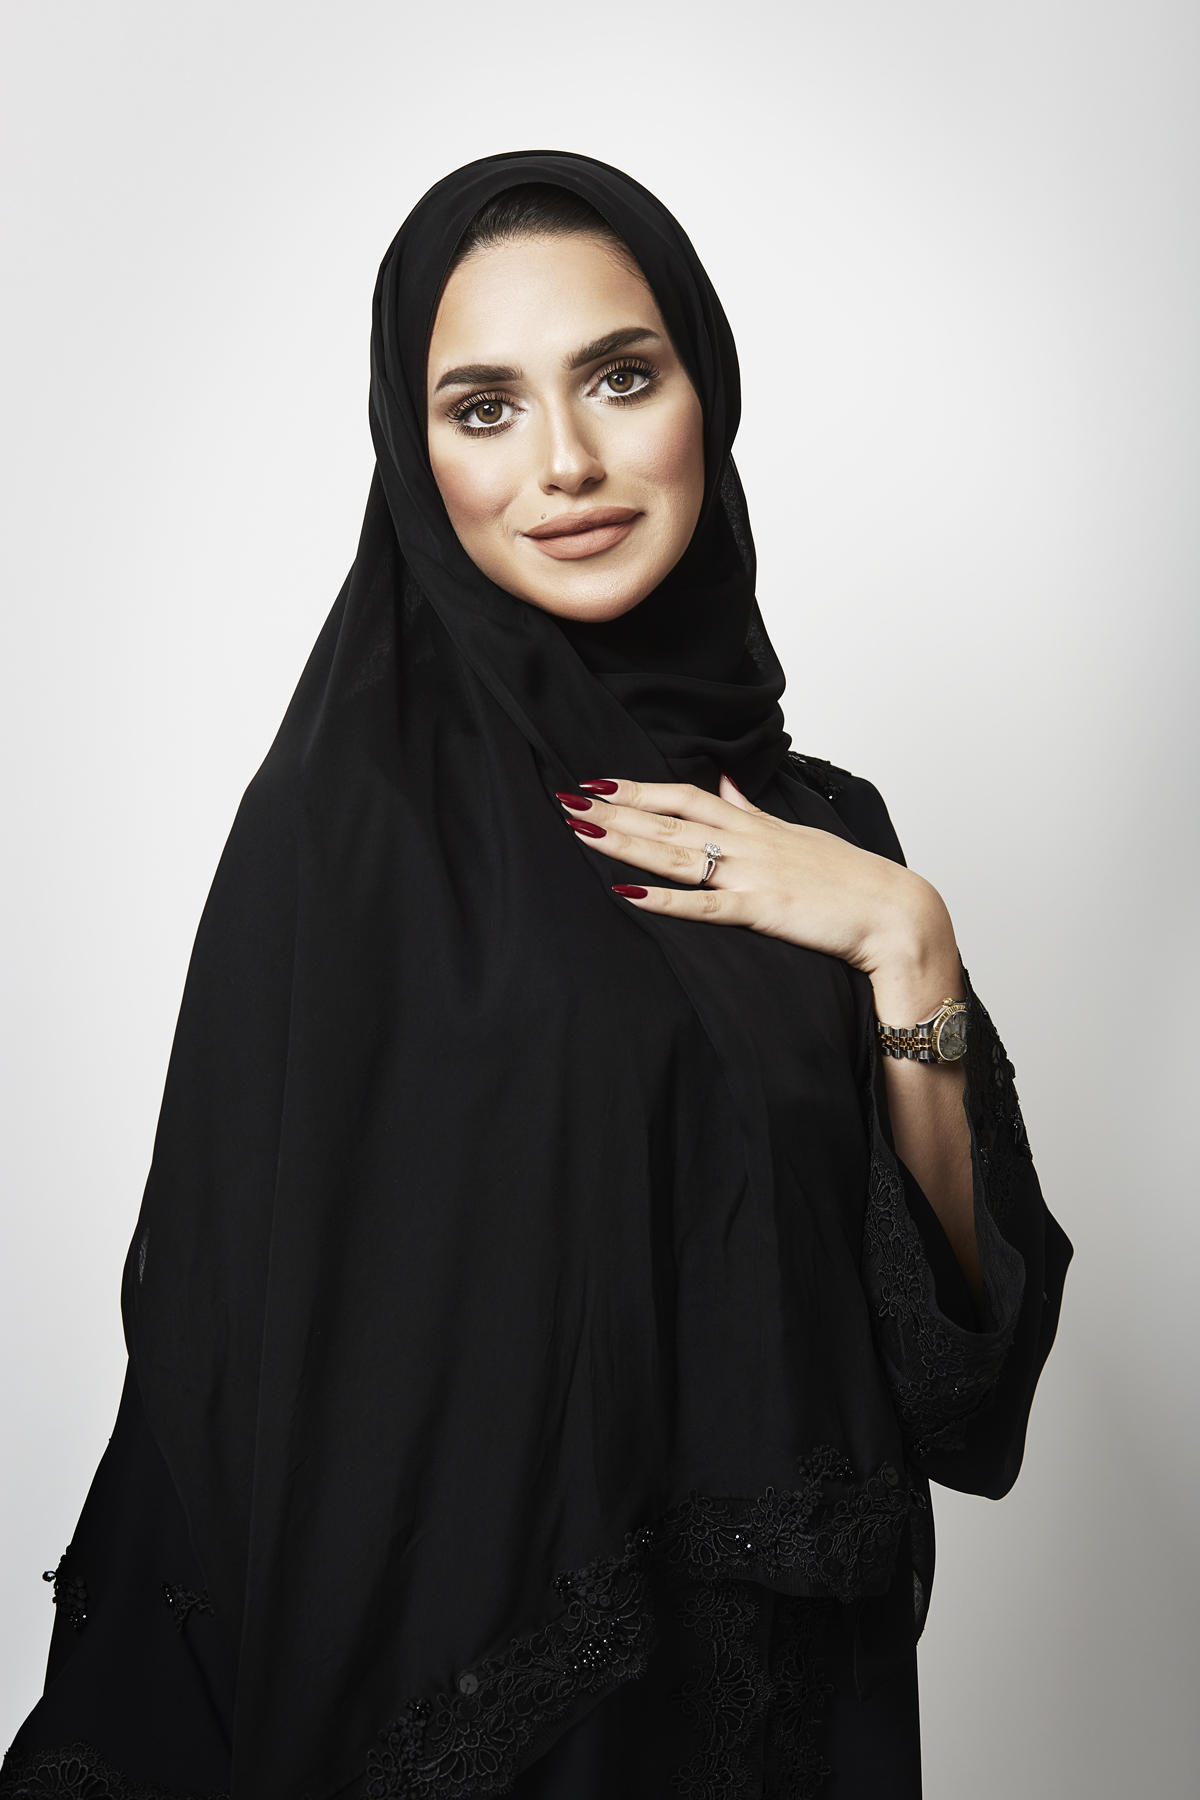 RanaldMackechnie.ADNOC Emirati Women's Day16.jpg